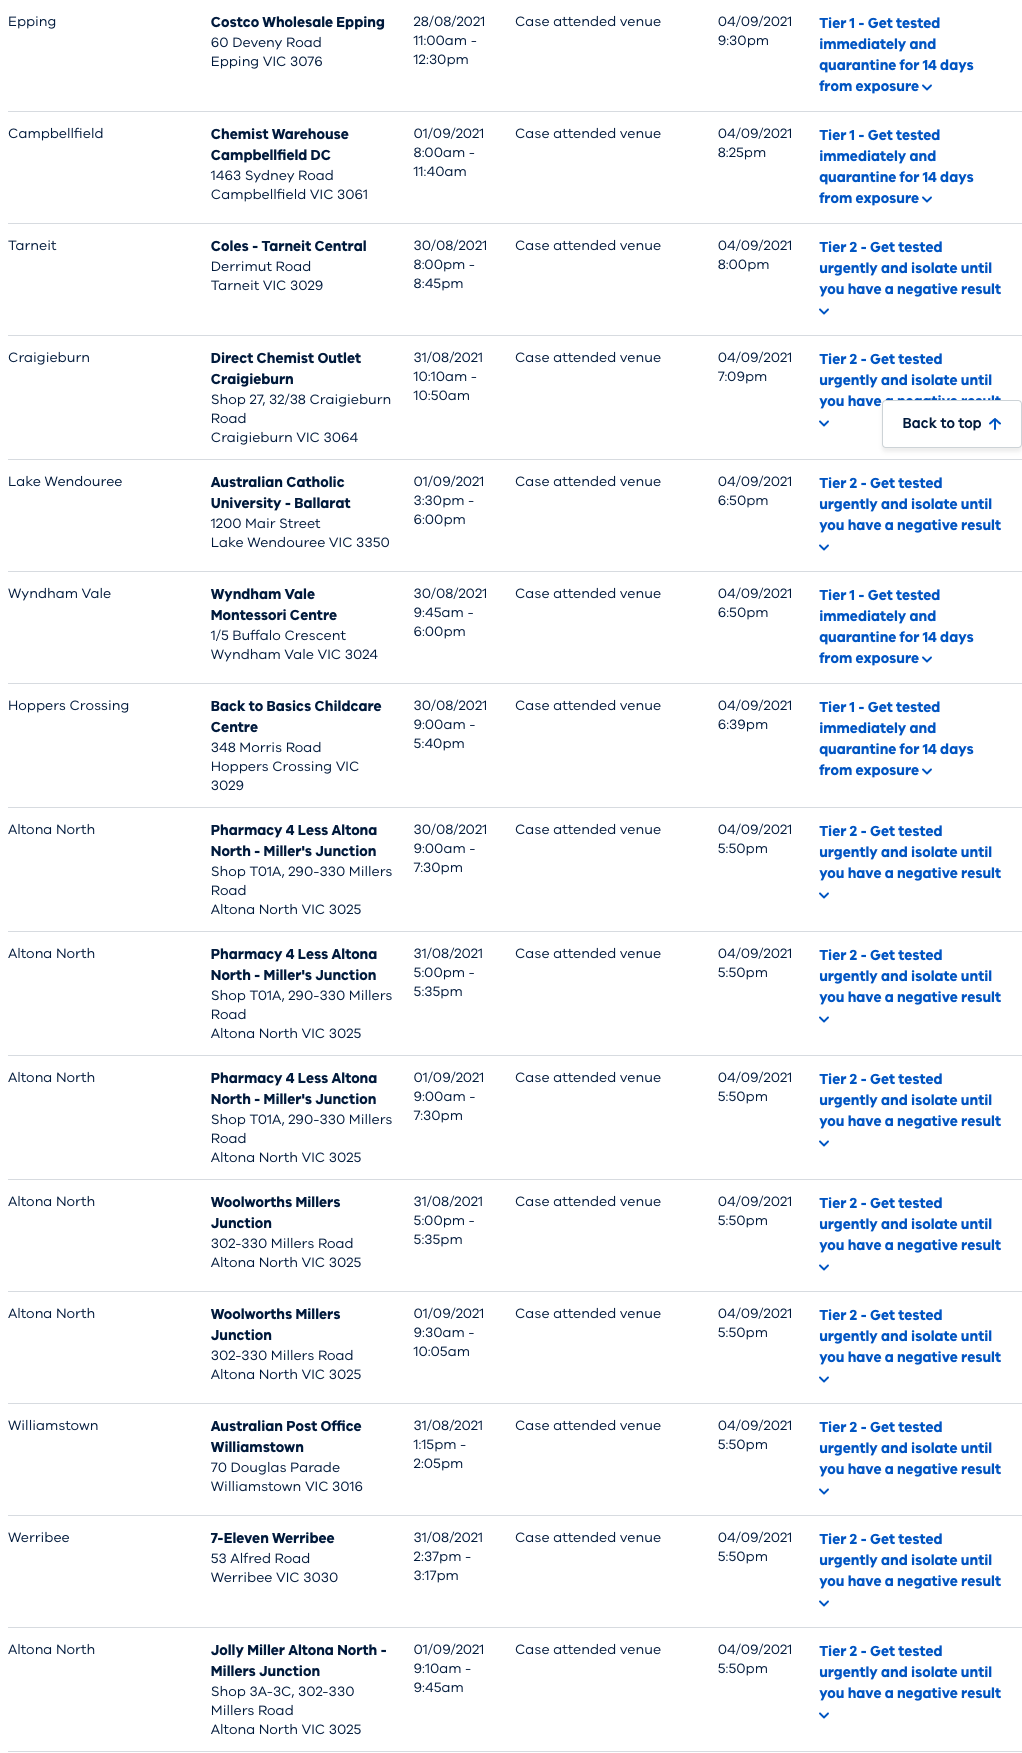 www.coronavirus.vic.gov.au_case-alerts%E2%80%93public-exposure-sites (5)的副本.png